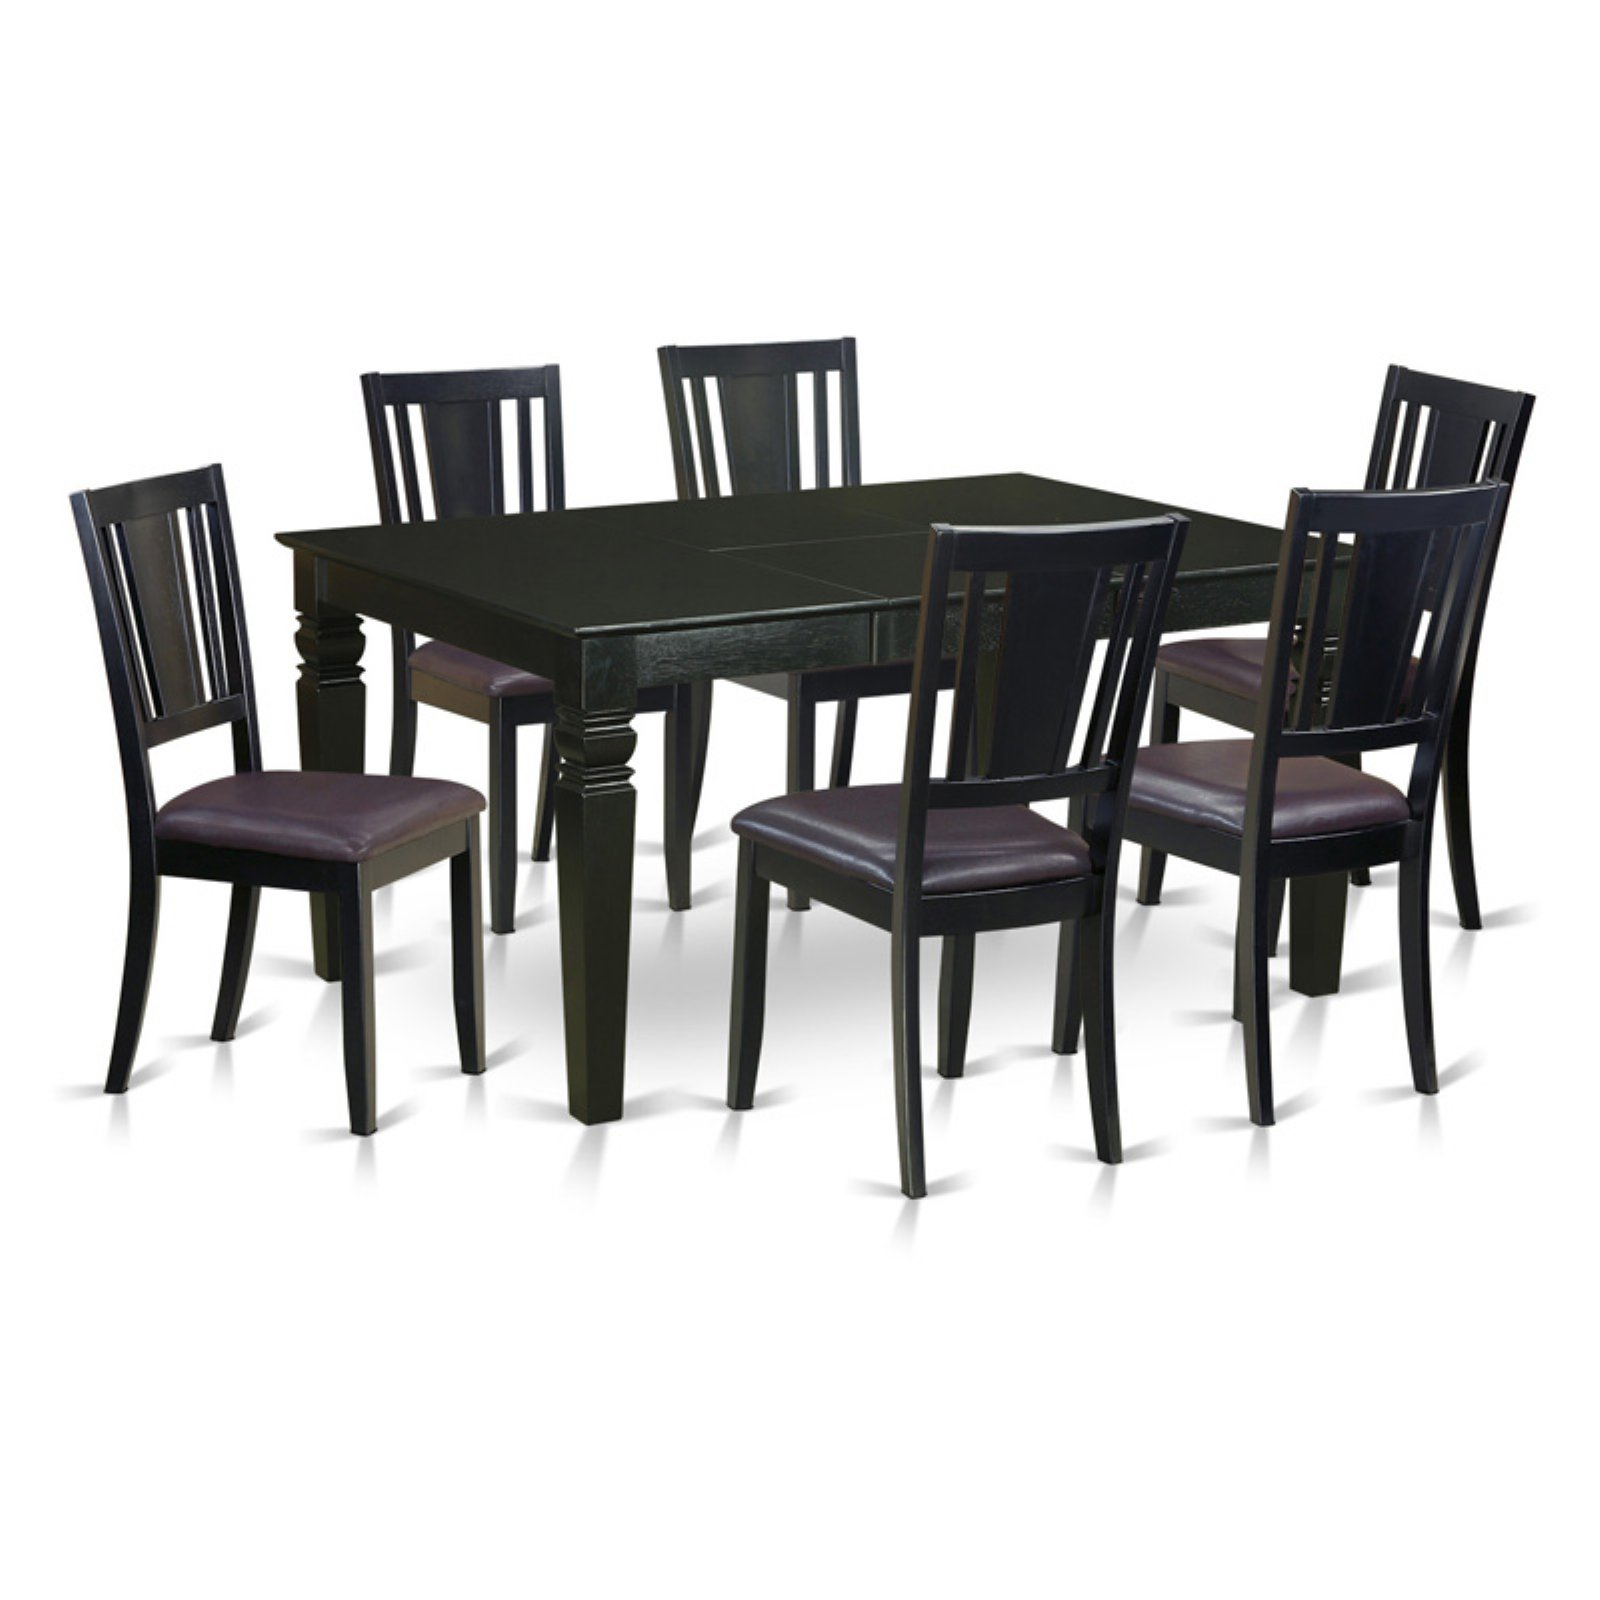 East West Furniture Weston 7 Piece Scotch Art Dining Table Set